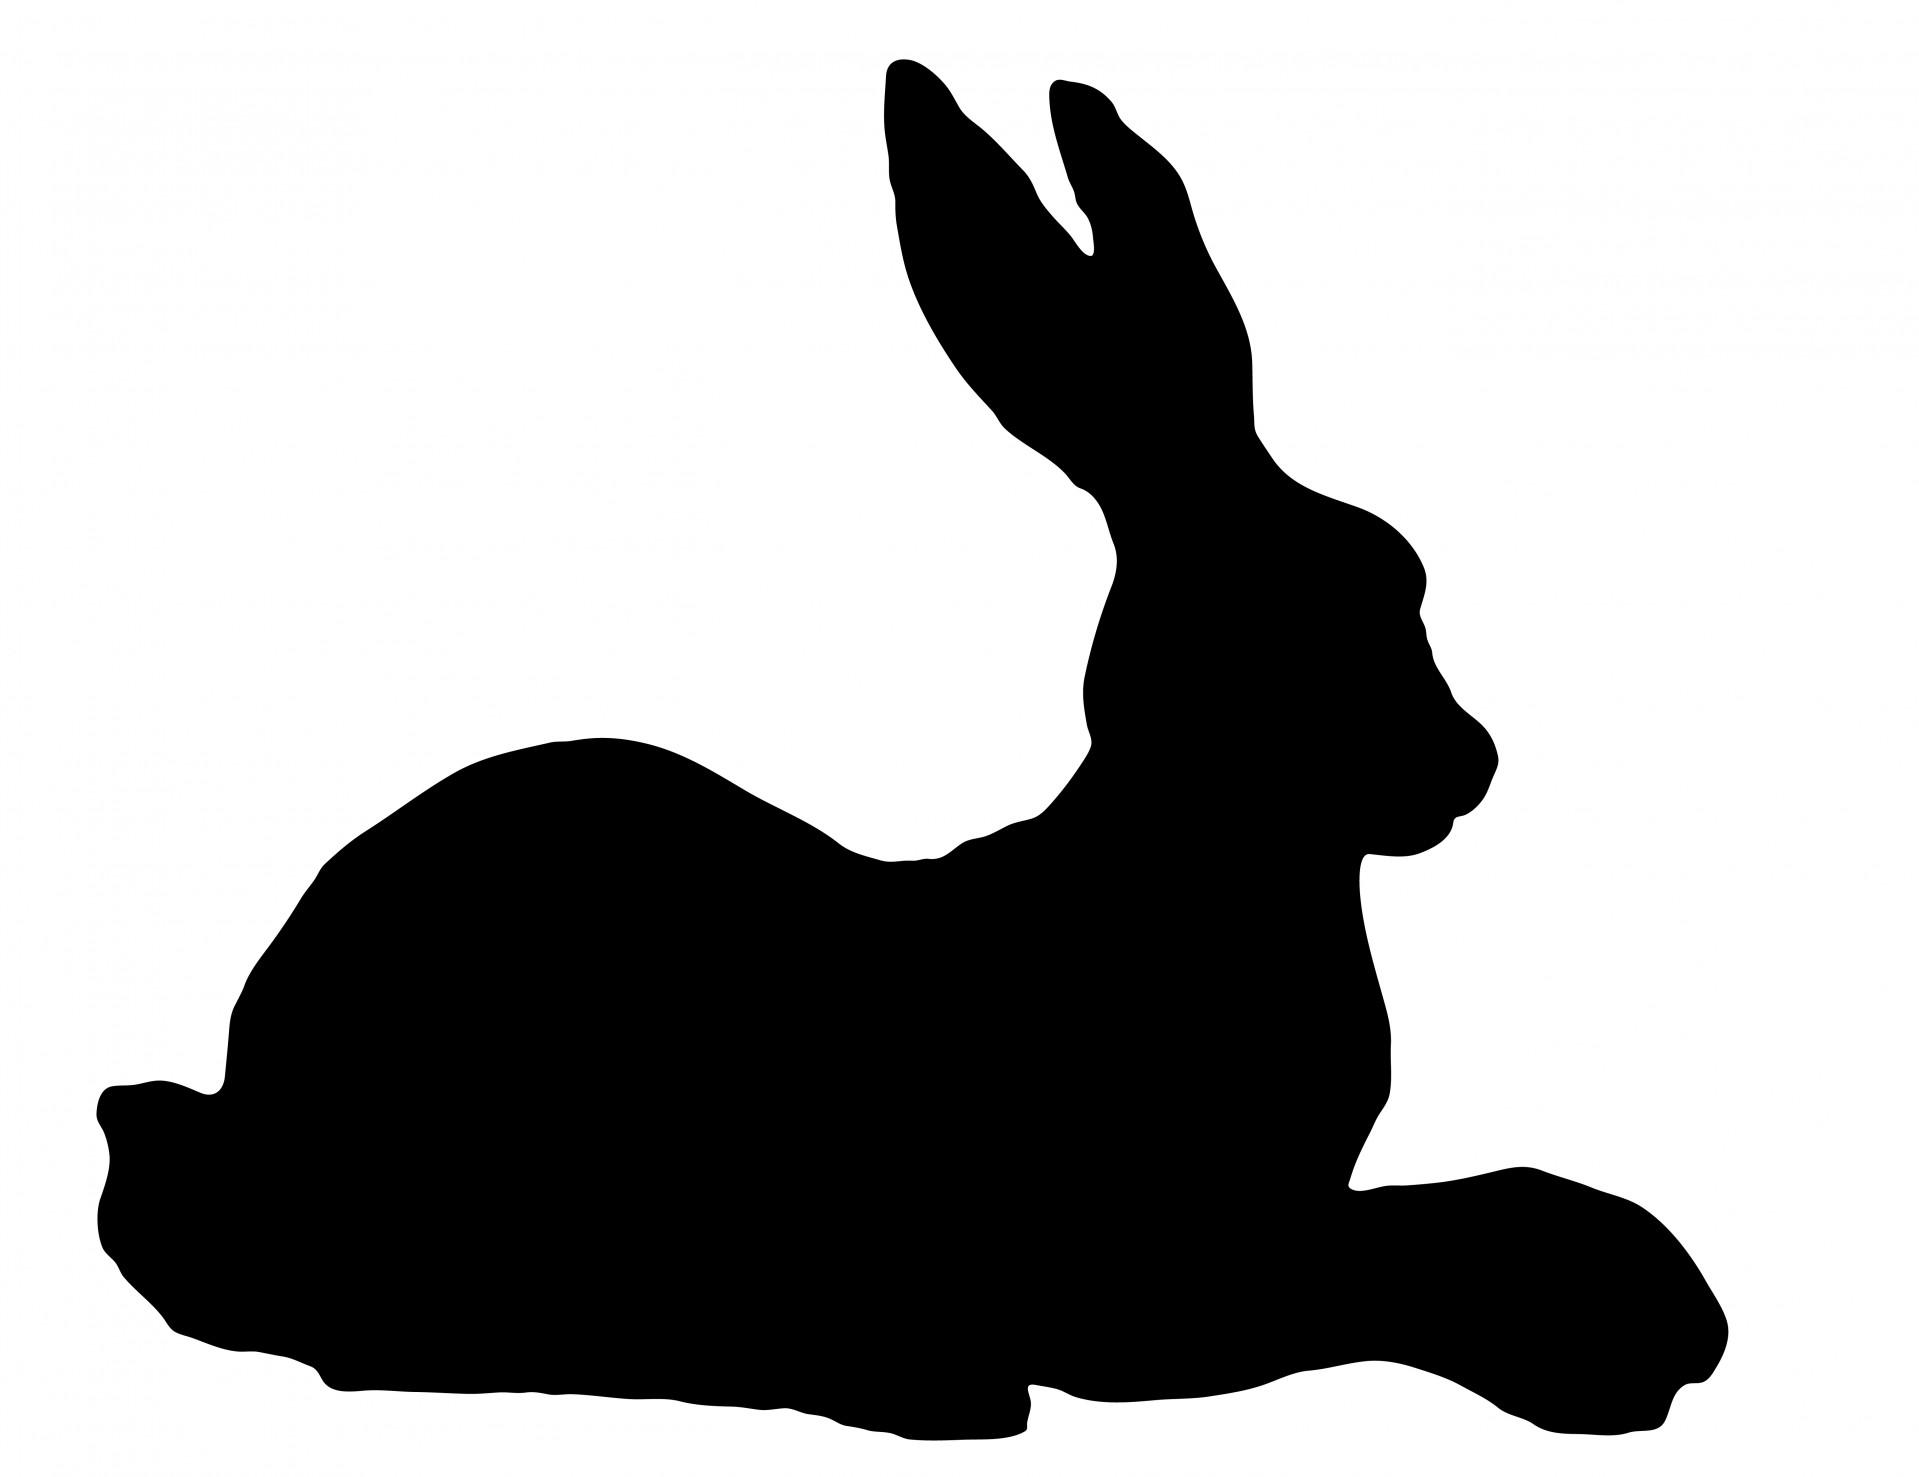 Hare clipart silhouette Silhouette Rabbit Free Clipart Public